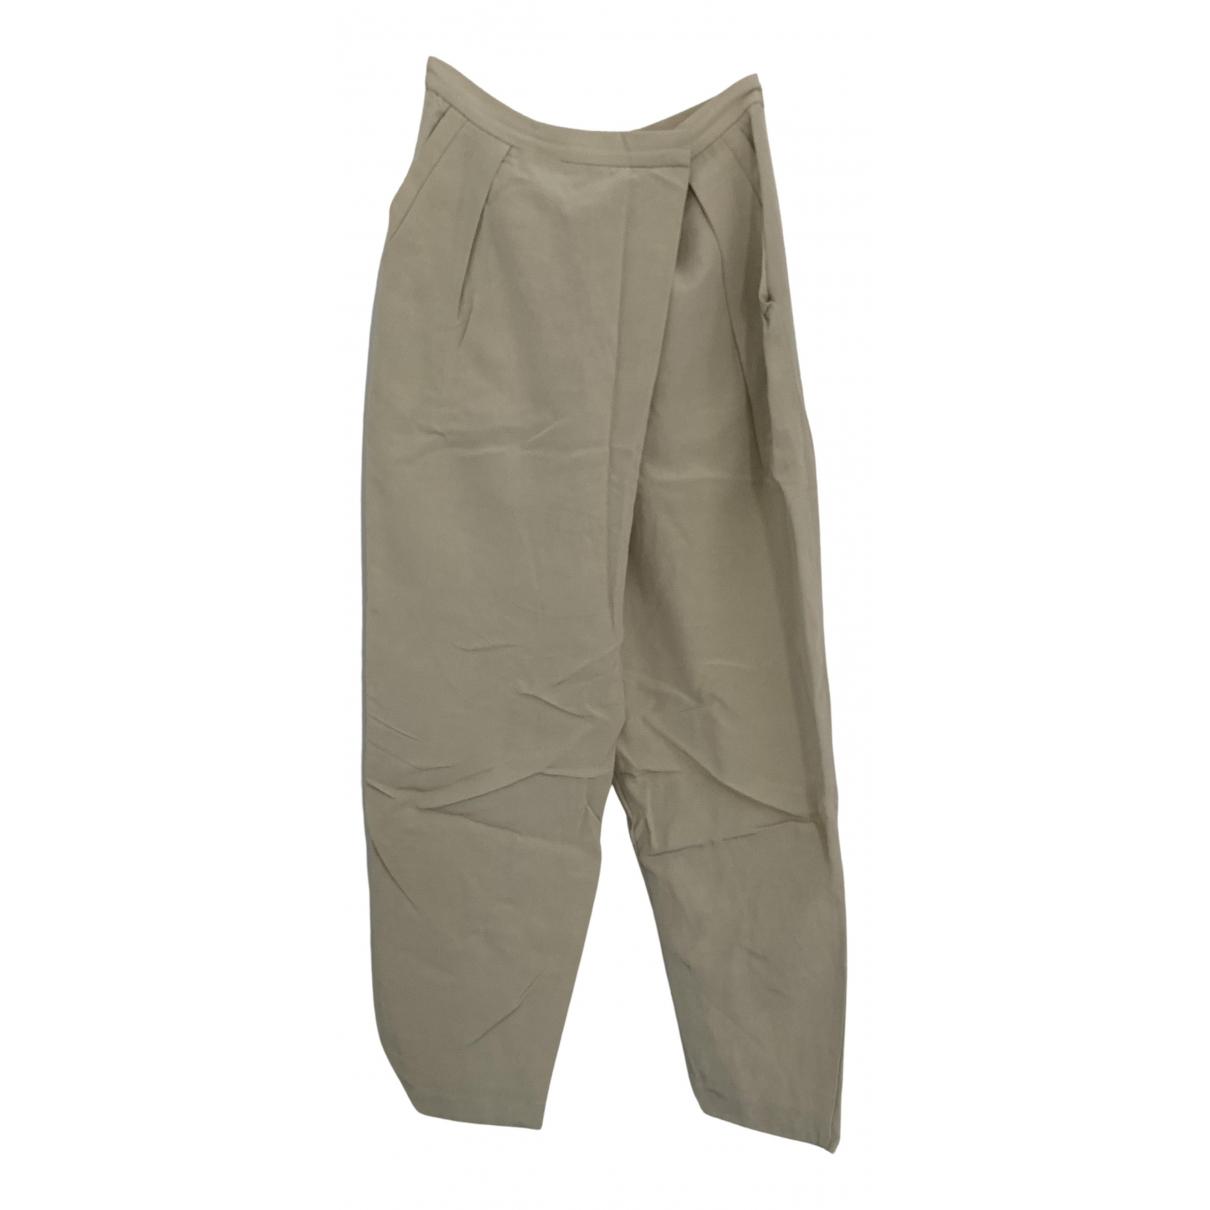 Stella Mccartney N Ecru Cotton Trousers for Women 38 FR